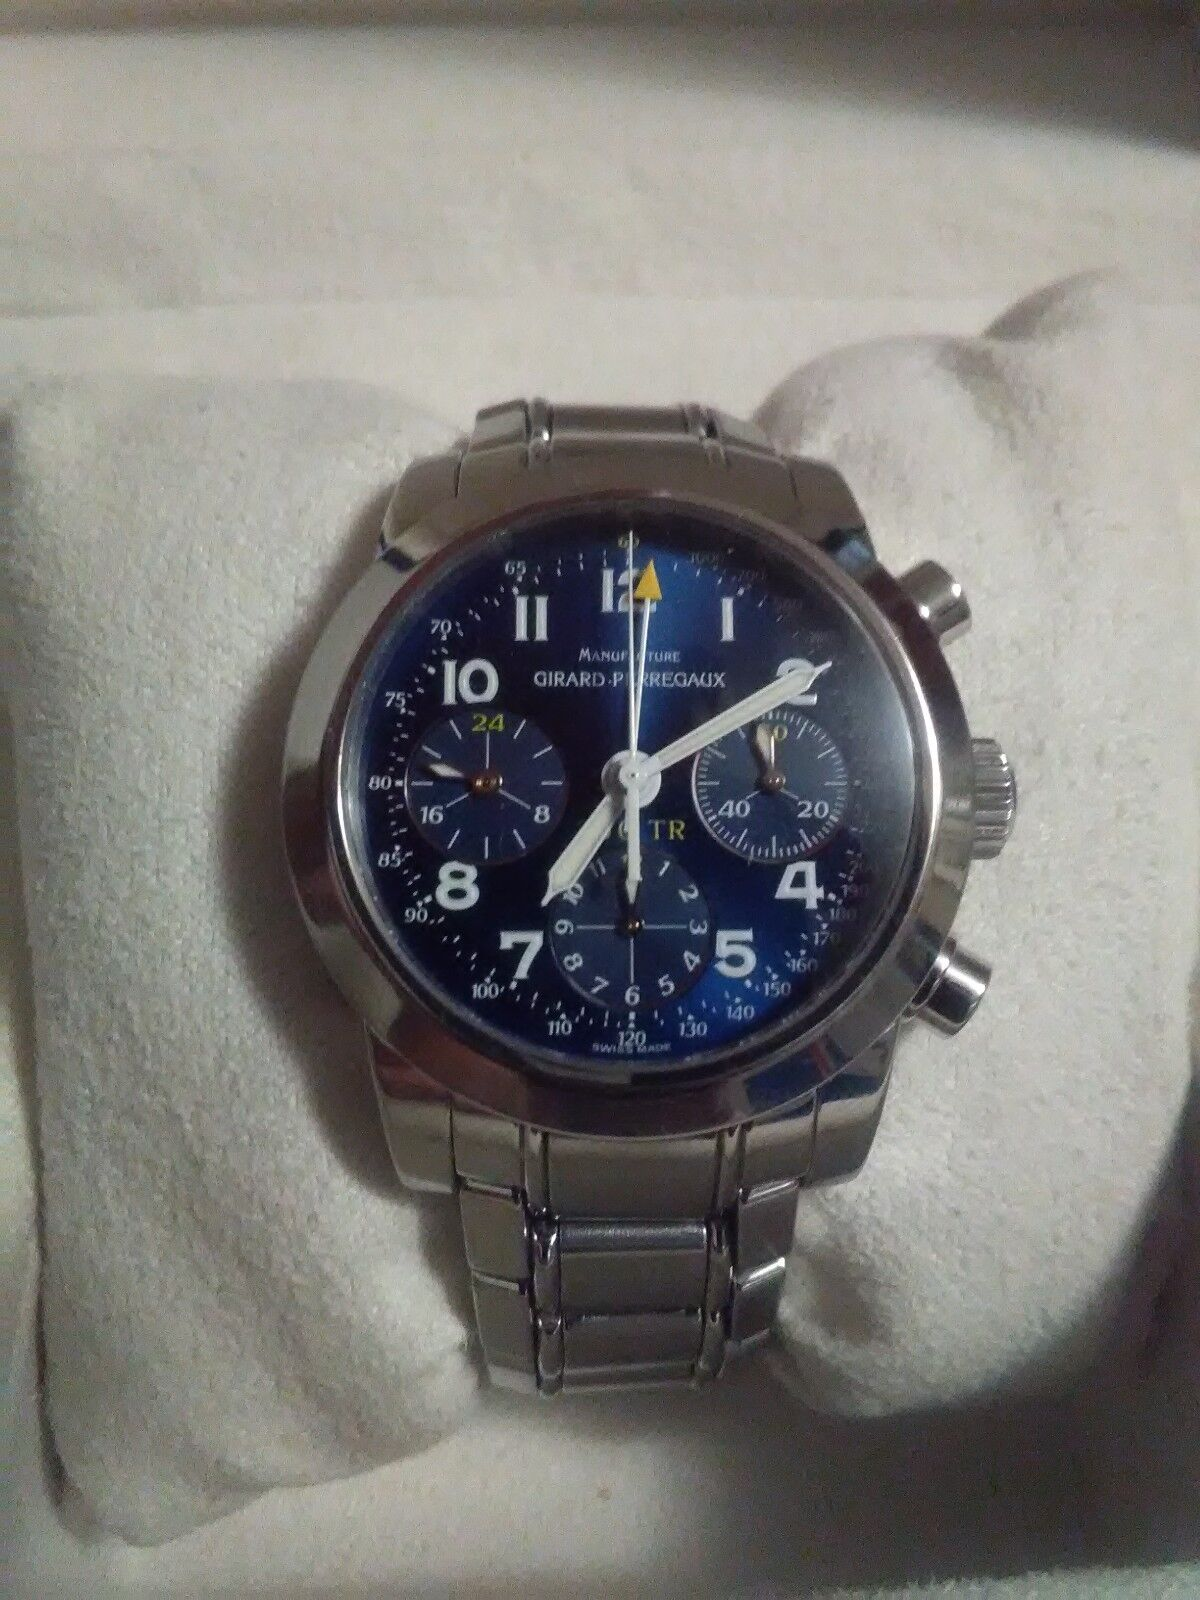 Girard Perregaux mens watch. Limited Edition 250TR Ferrari Testarossa N°278/2000 - watch picture 1